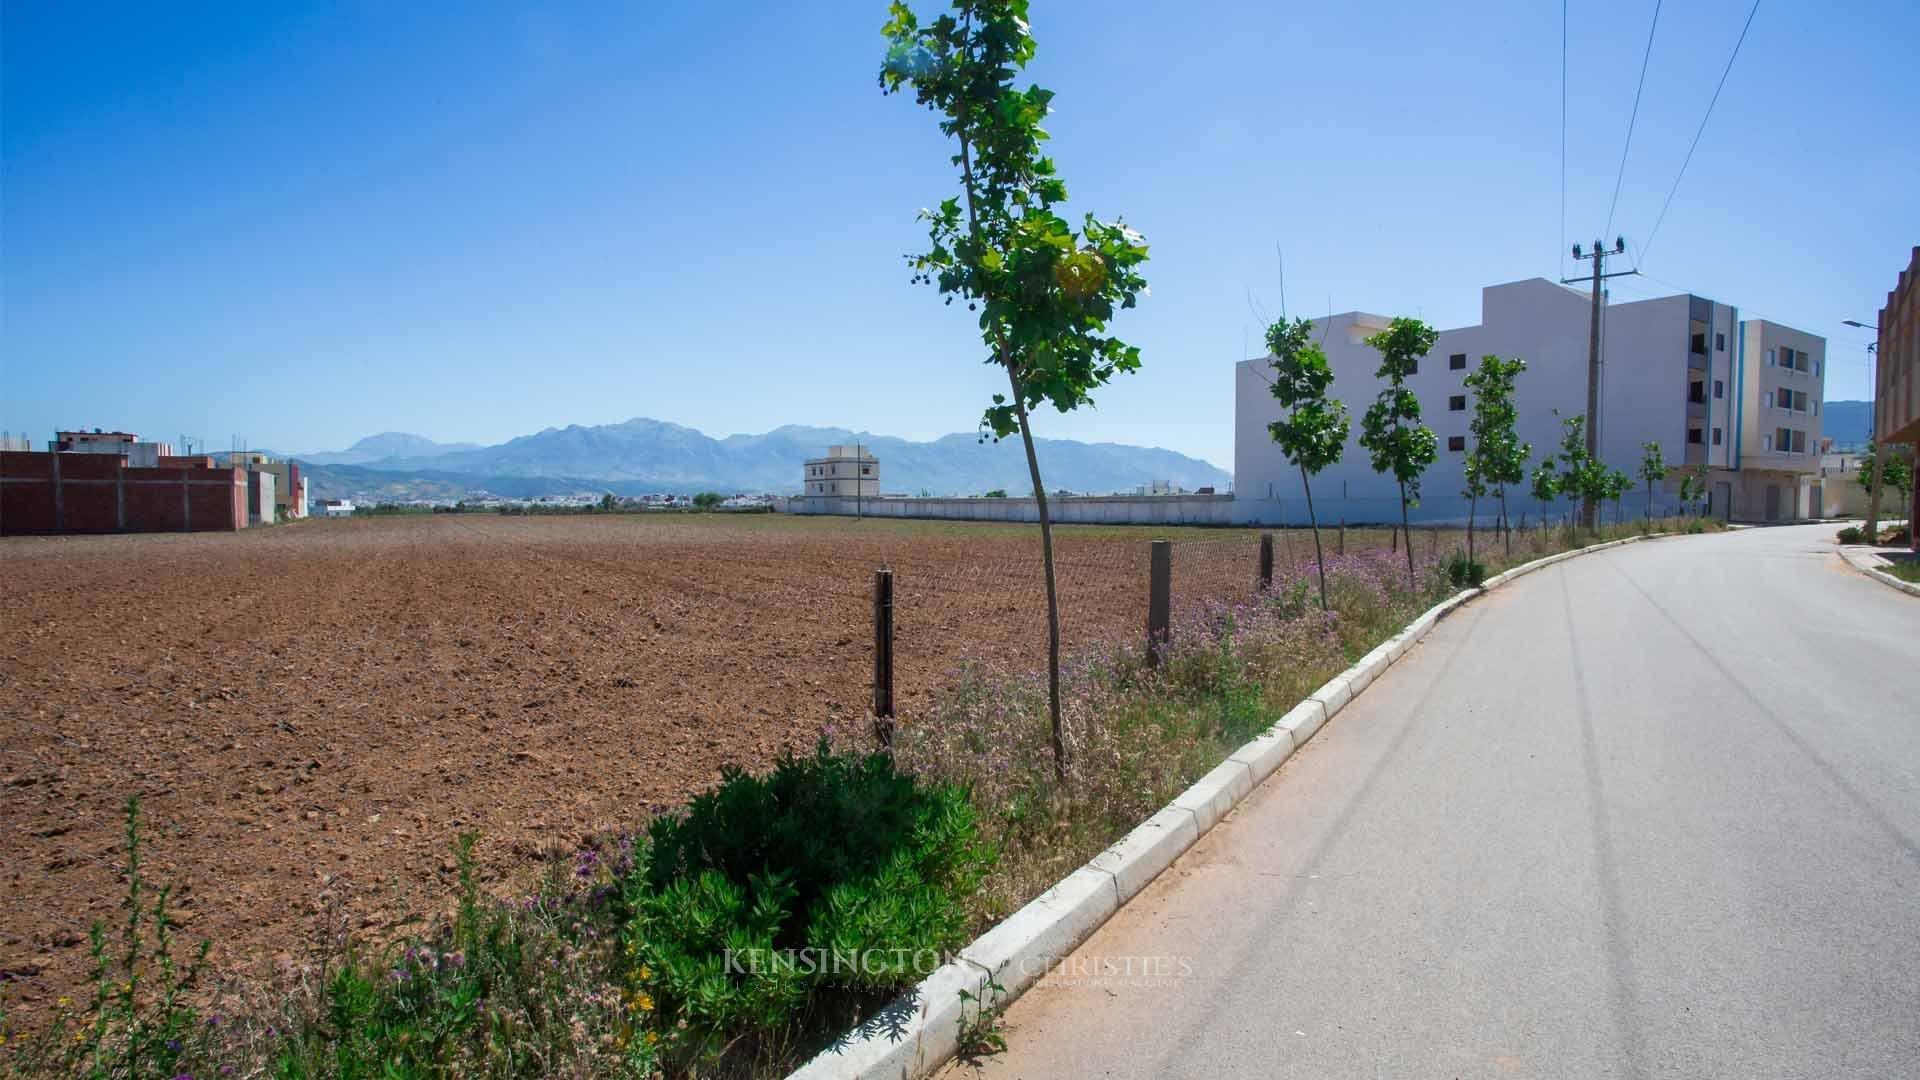 KPPM01238: Land Tetouan 2 Building land Tétouan Morocco